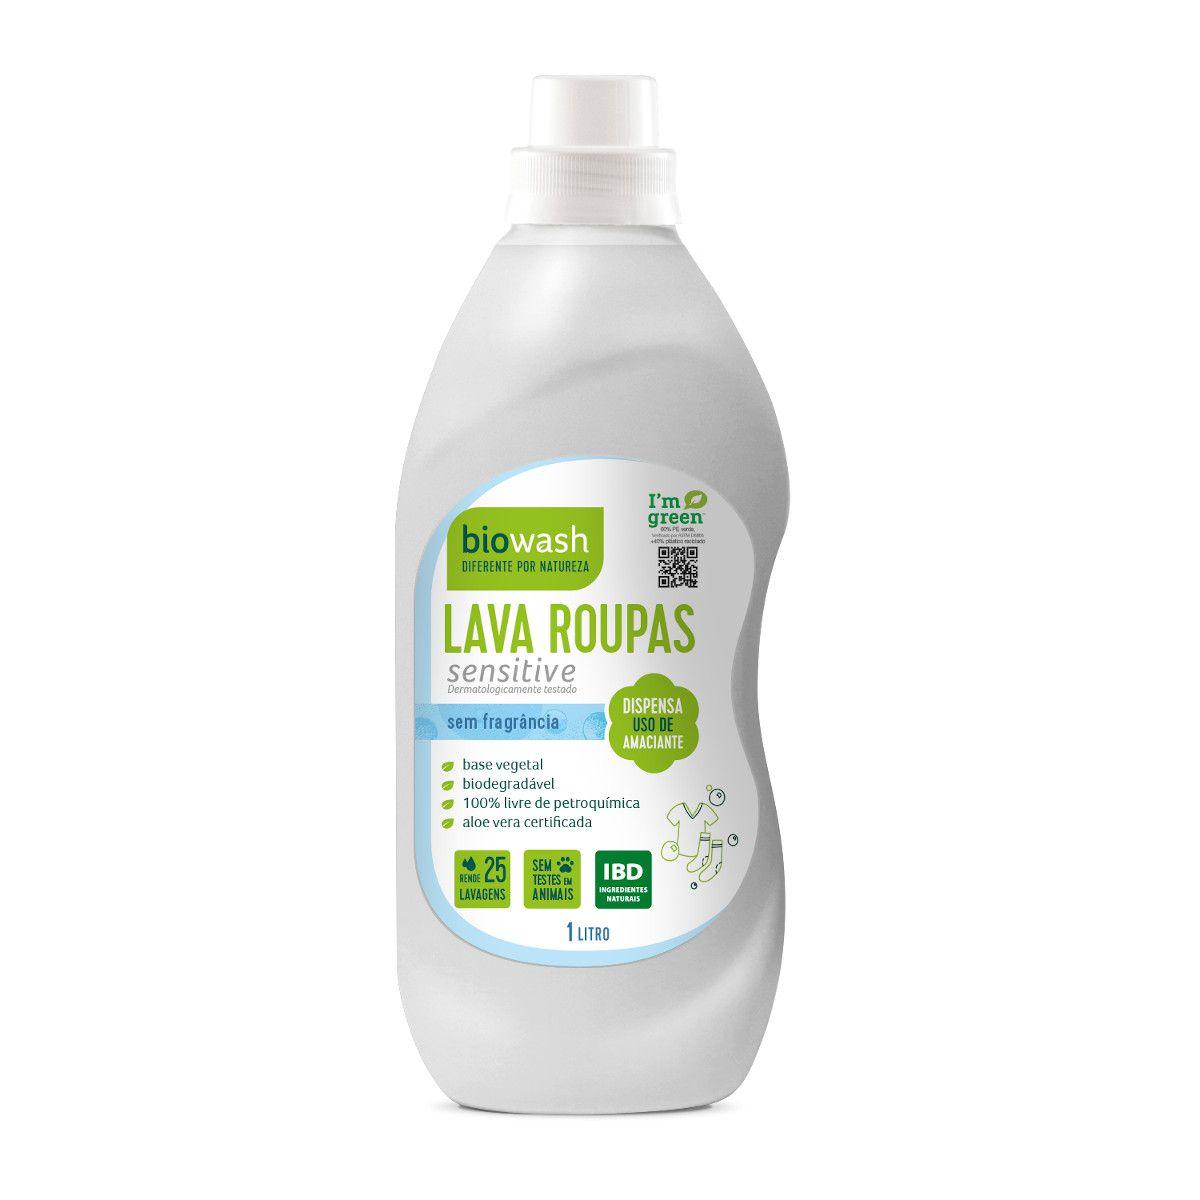 Lava Roupas Sensitive Concentrado 1 litro Biowash